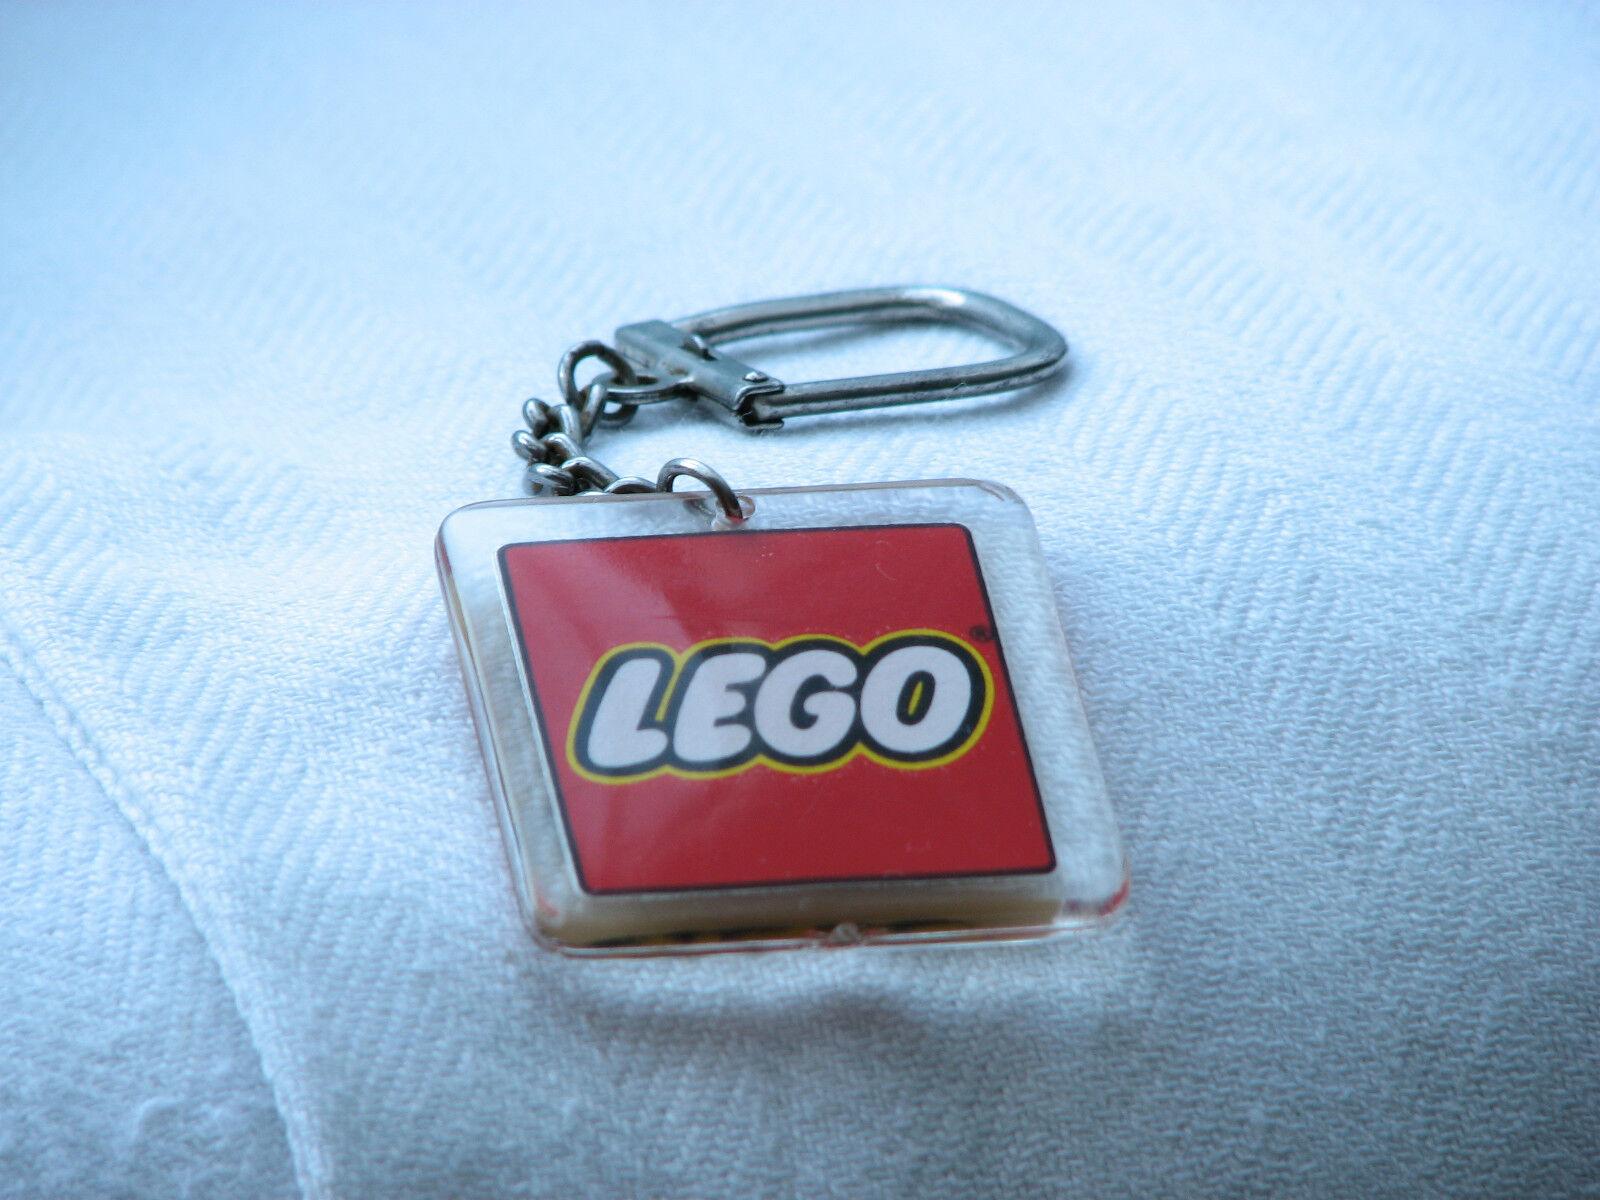 Keychain Lego Duplo rare used classic key ring